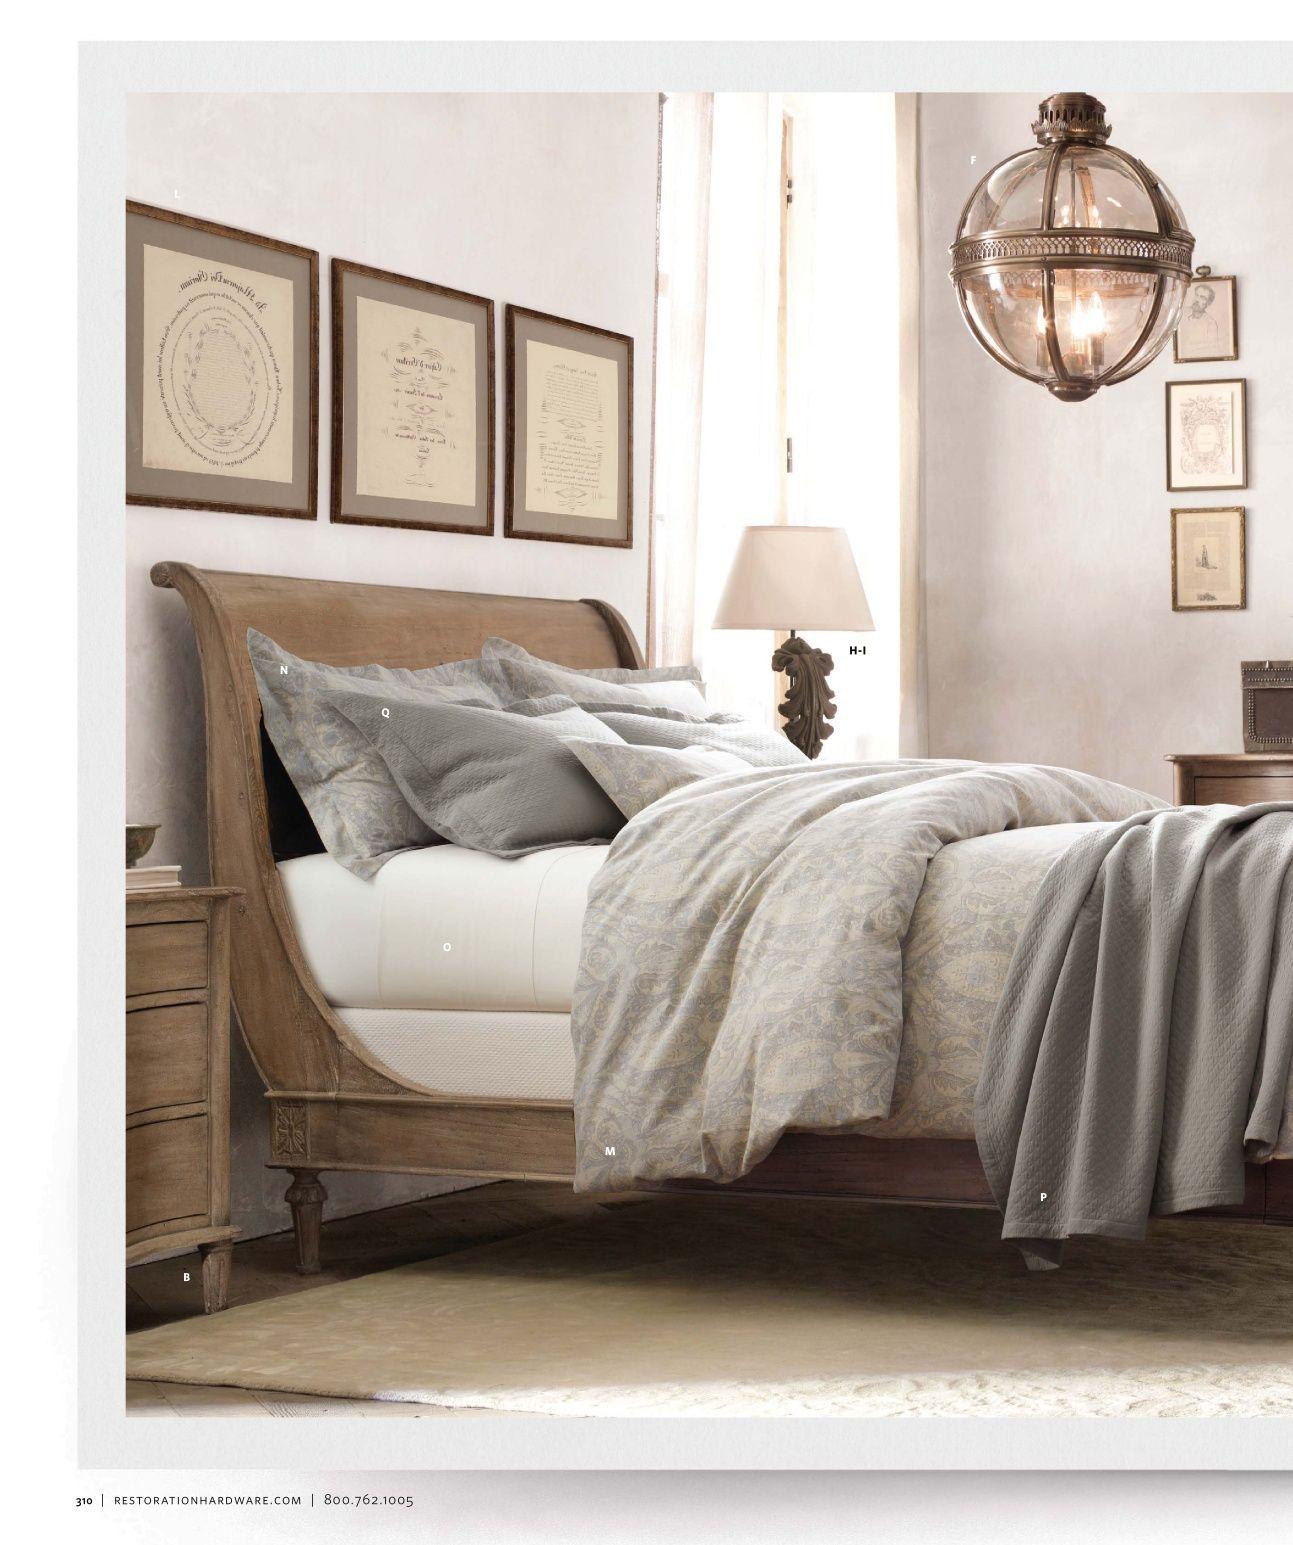 Bedroom & light Restoration Hardware Diy home decor